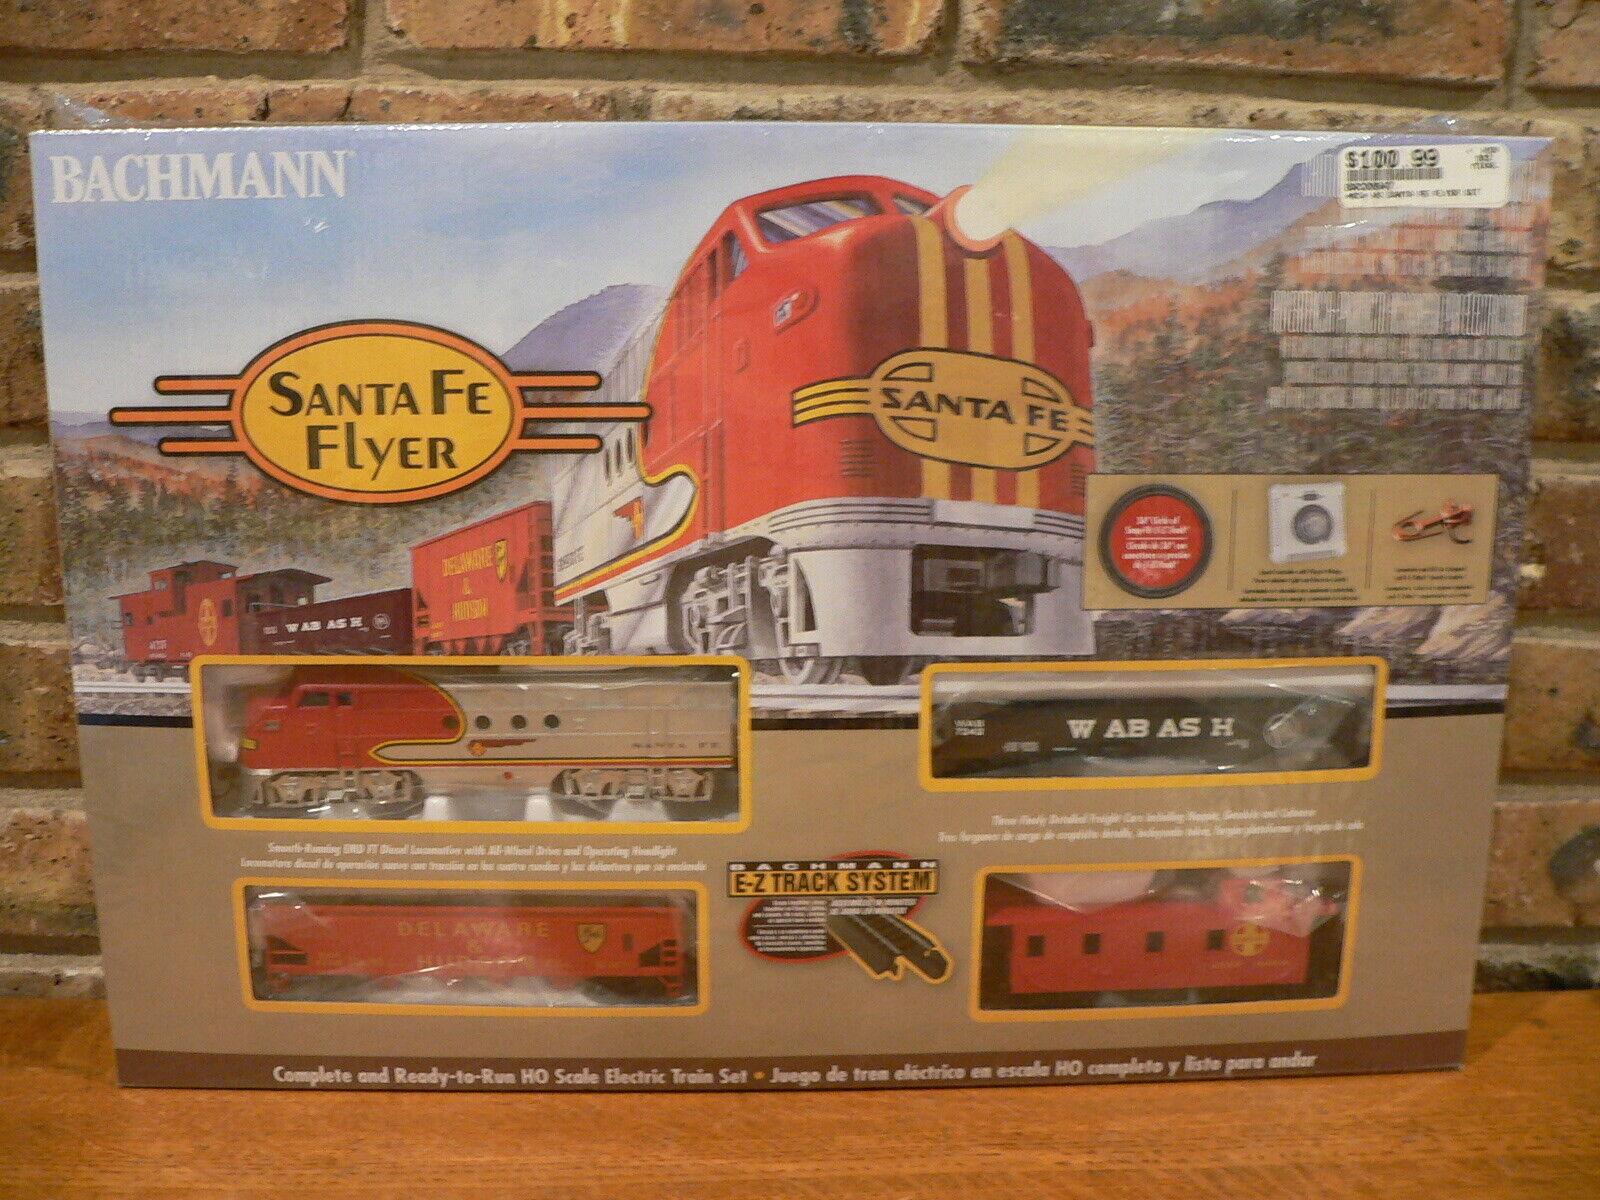 Bachmann Escala Ho Santa Fe Flyer modelo del ferroCocheril Train Set  00647  Nuevo, Sellado